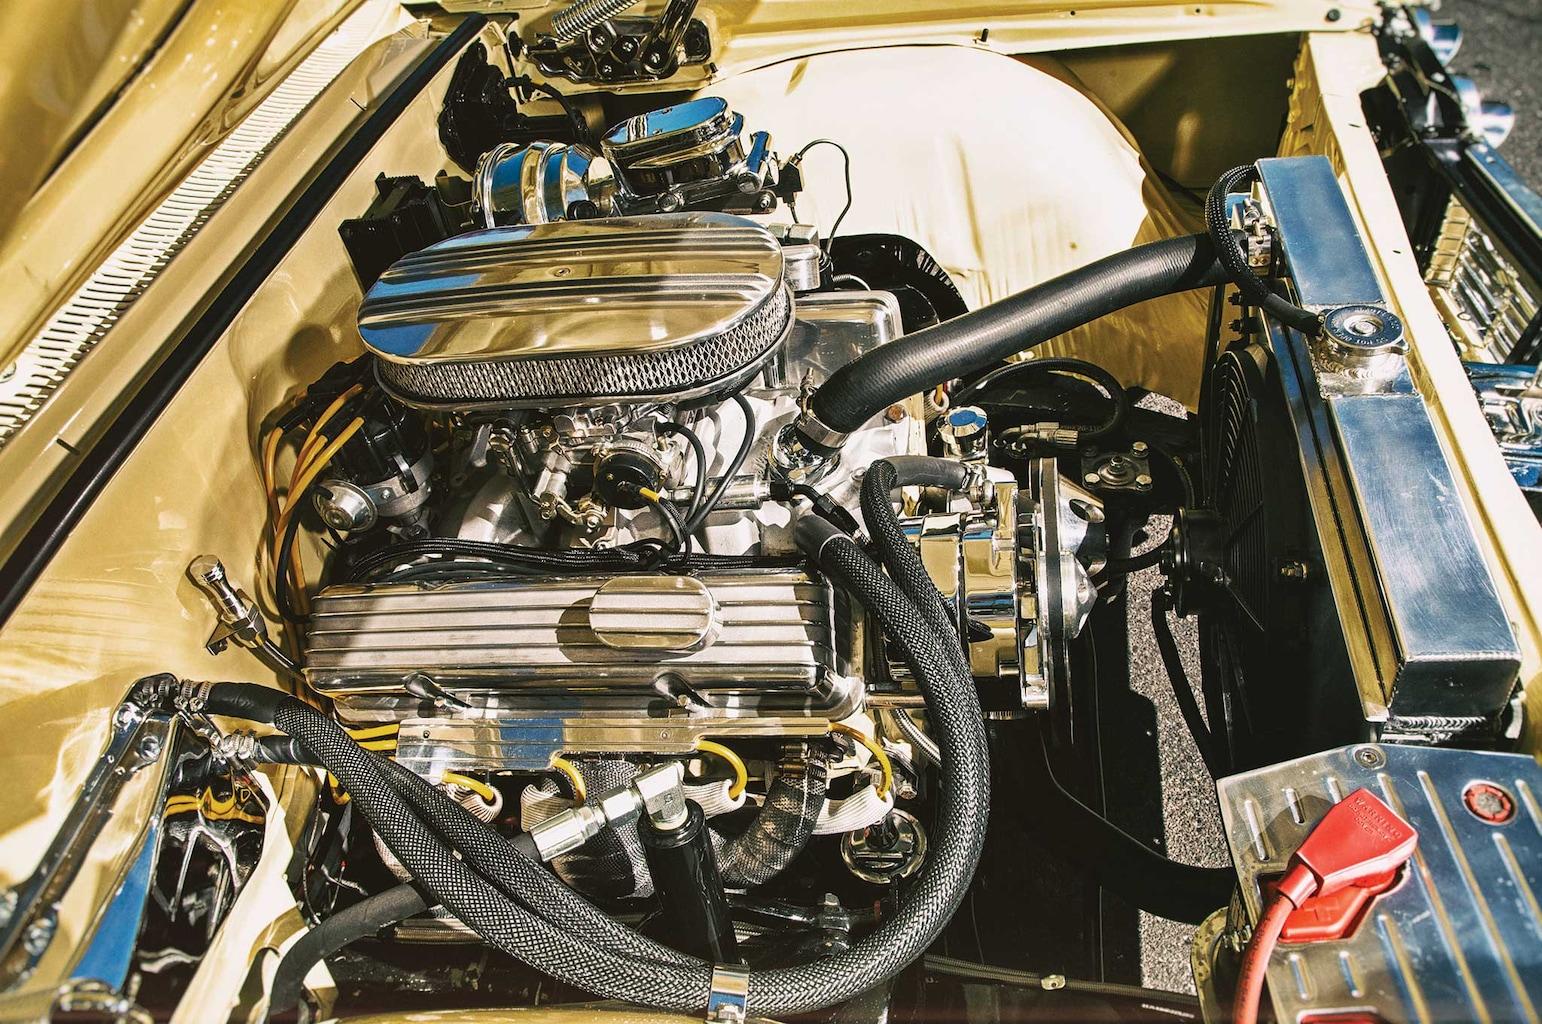 1964 chevrolet impala 350 crate motor 004